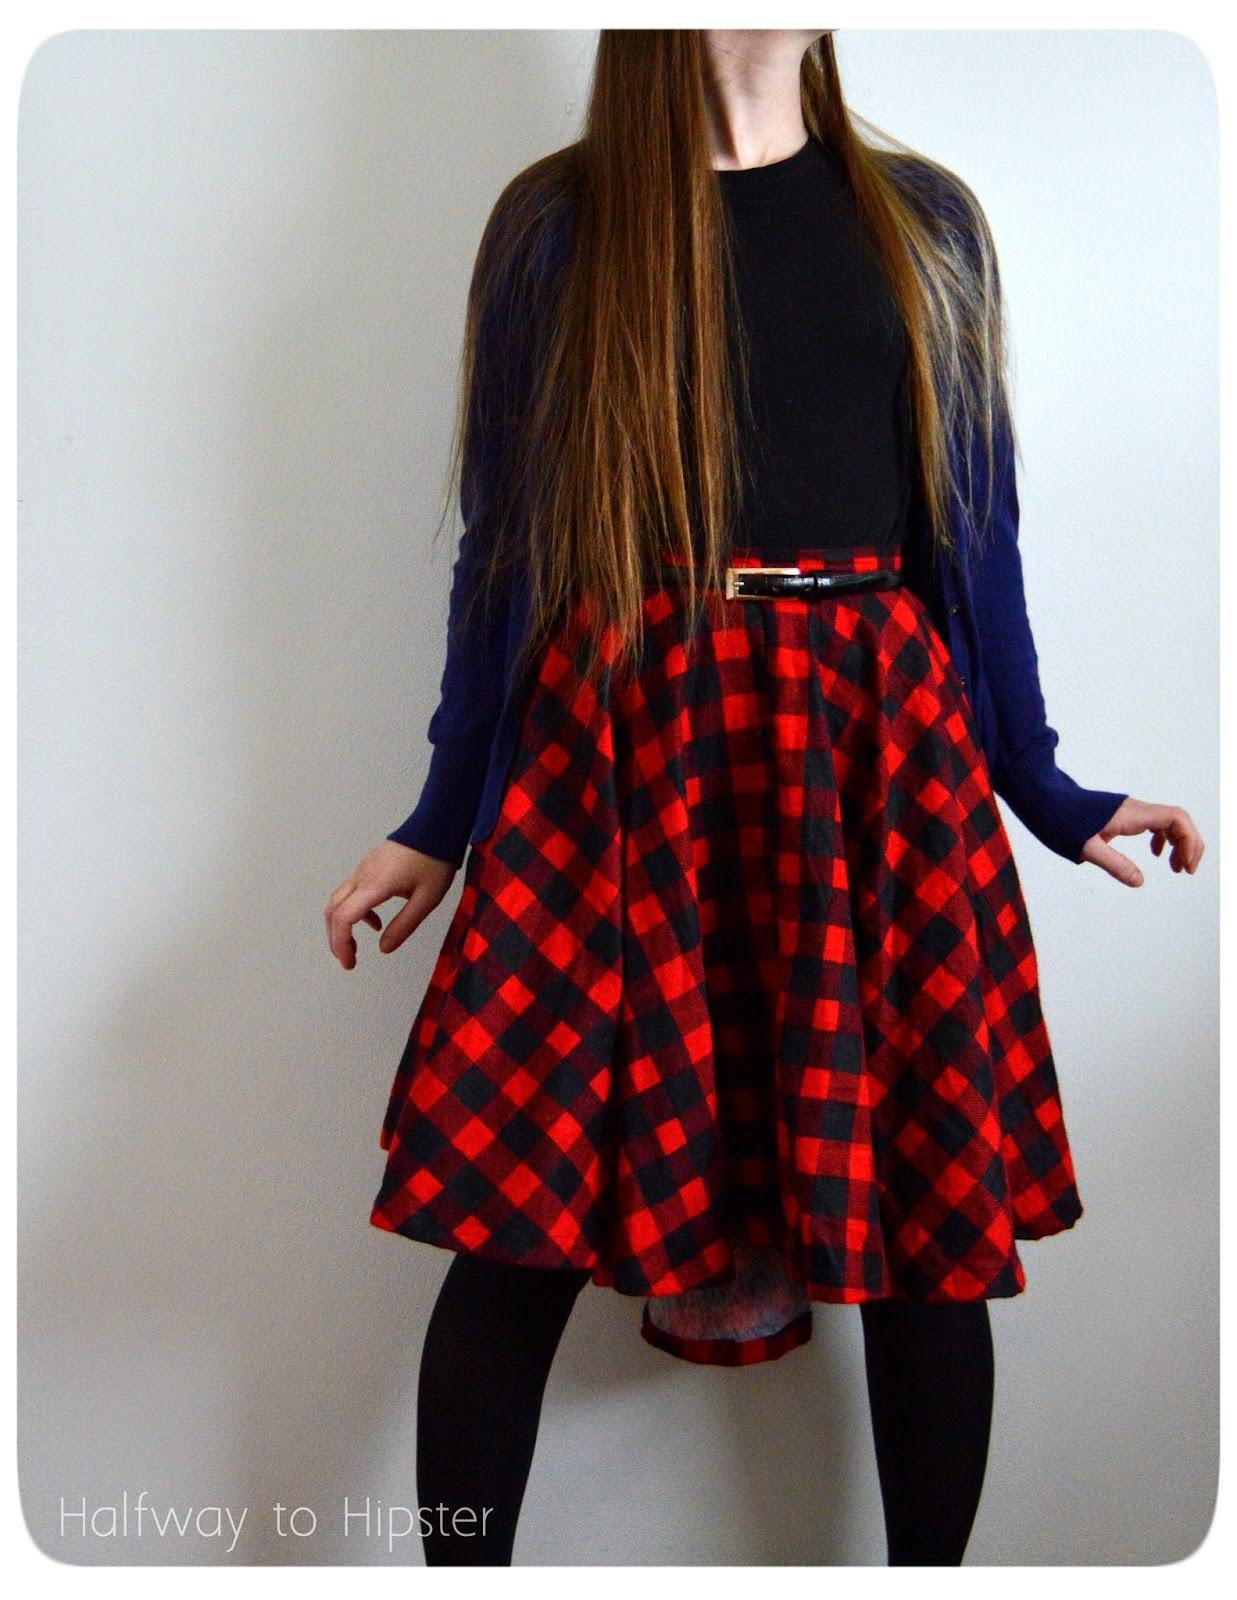 dce7fa30b8d6 Halfway To Hipster: DIY Hi-Lo Circle Skirt